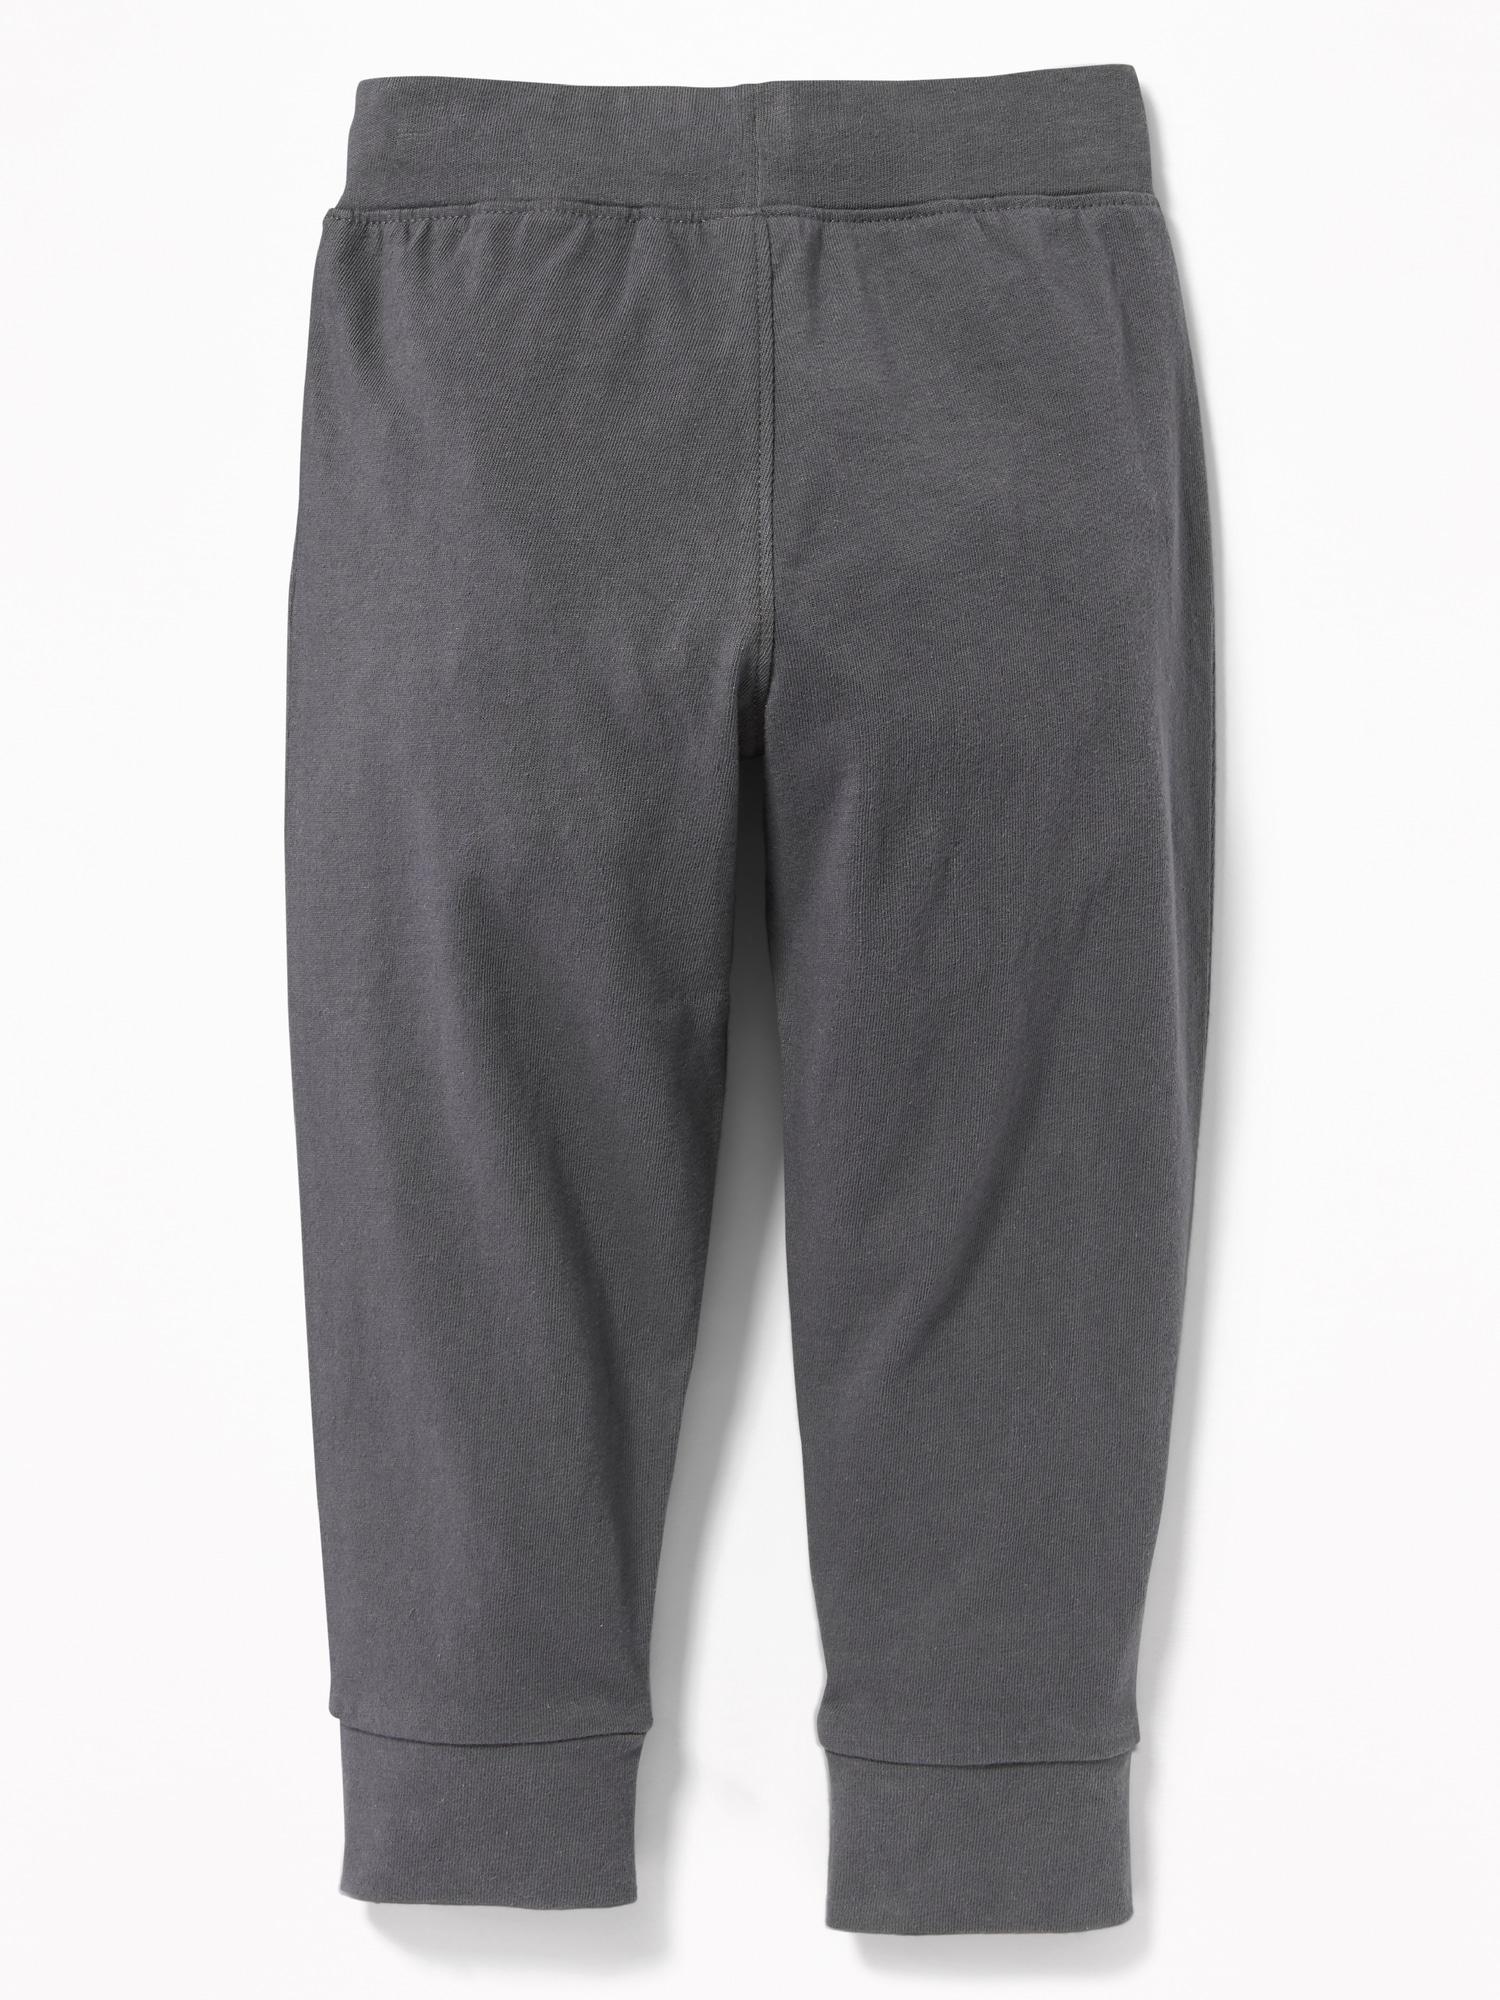 New York City Kids Cotton Sweatpants,Jogger Long Jersey Sweatpants